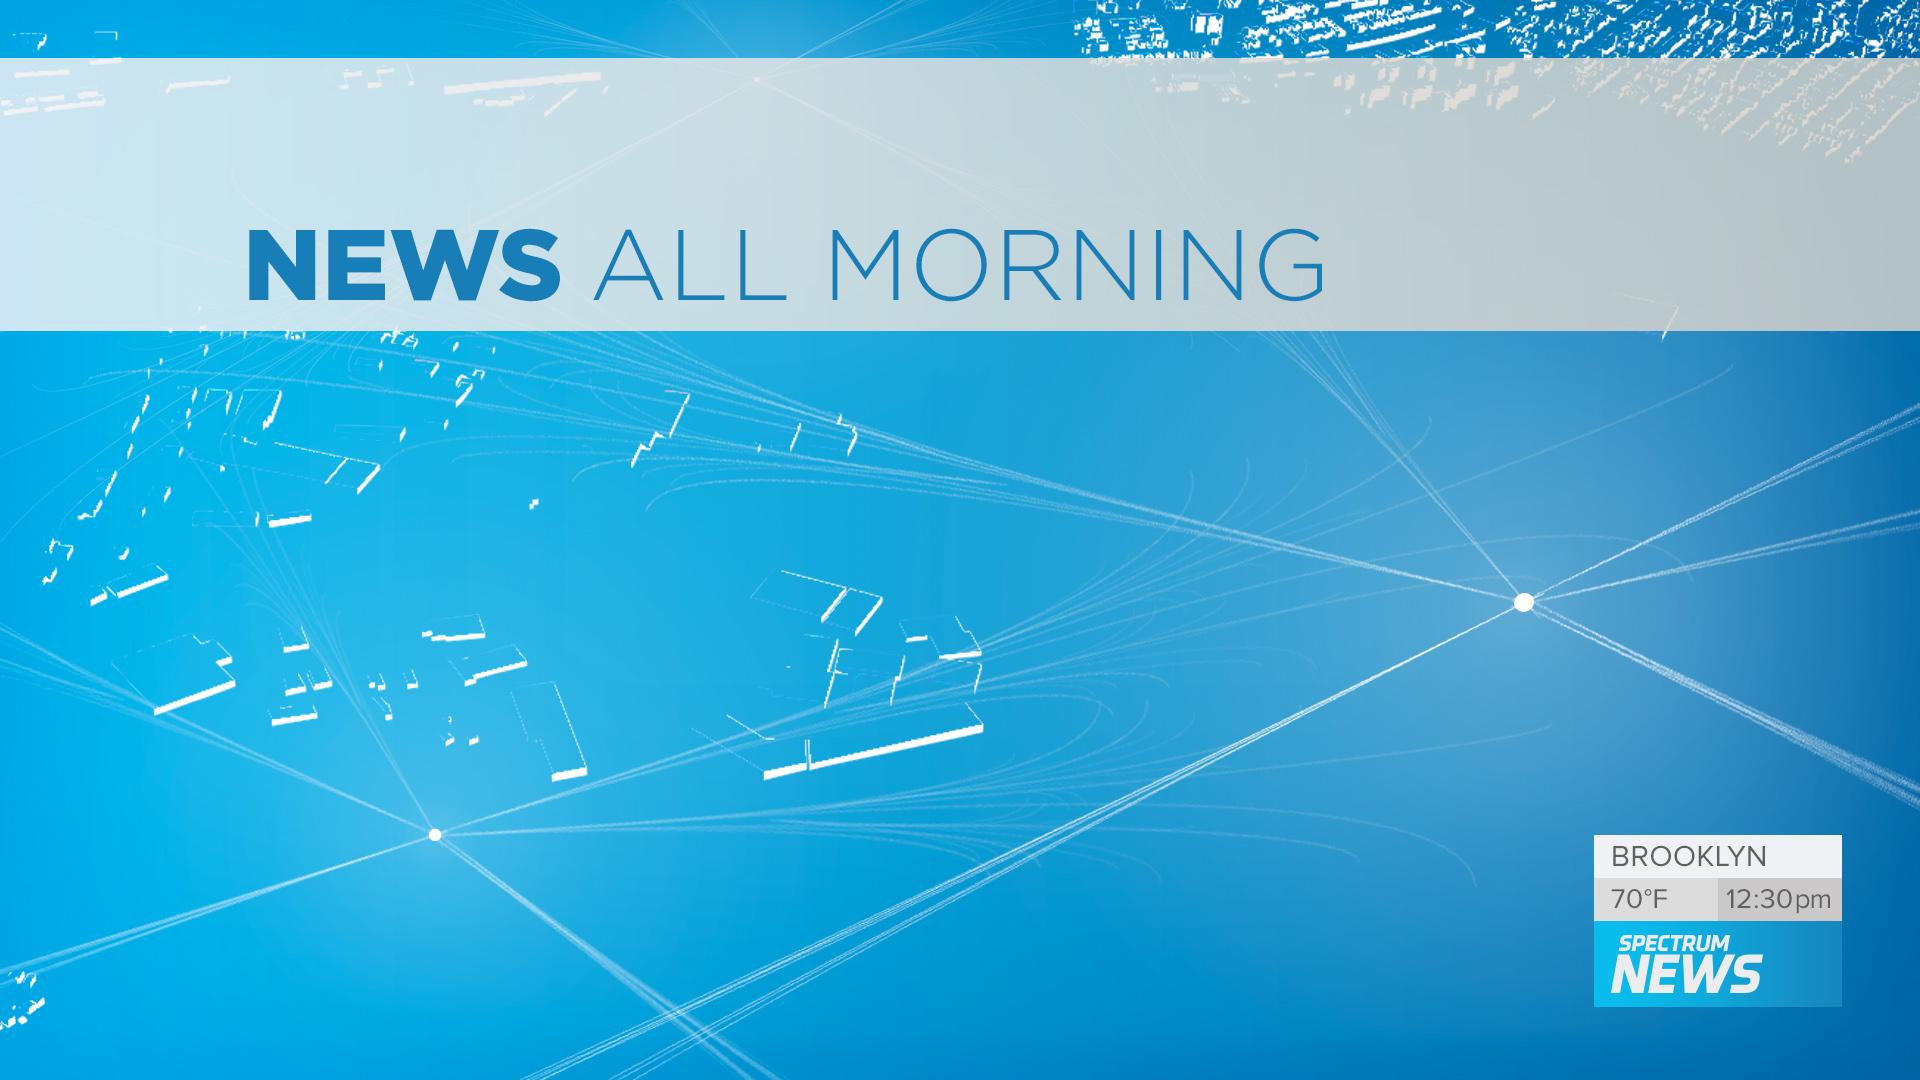 gh_SN-NewsAllMorning_AM.jpg